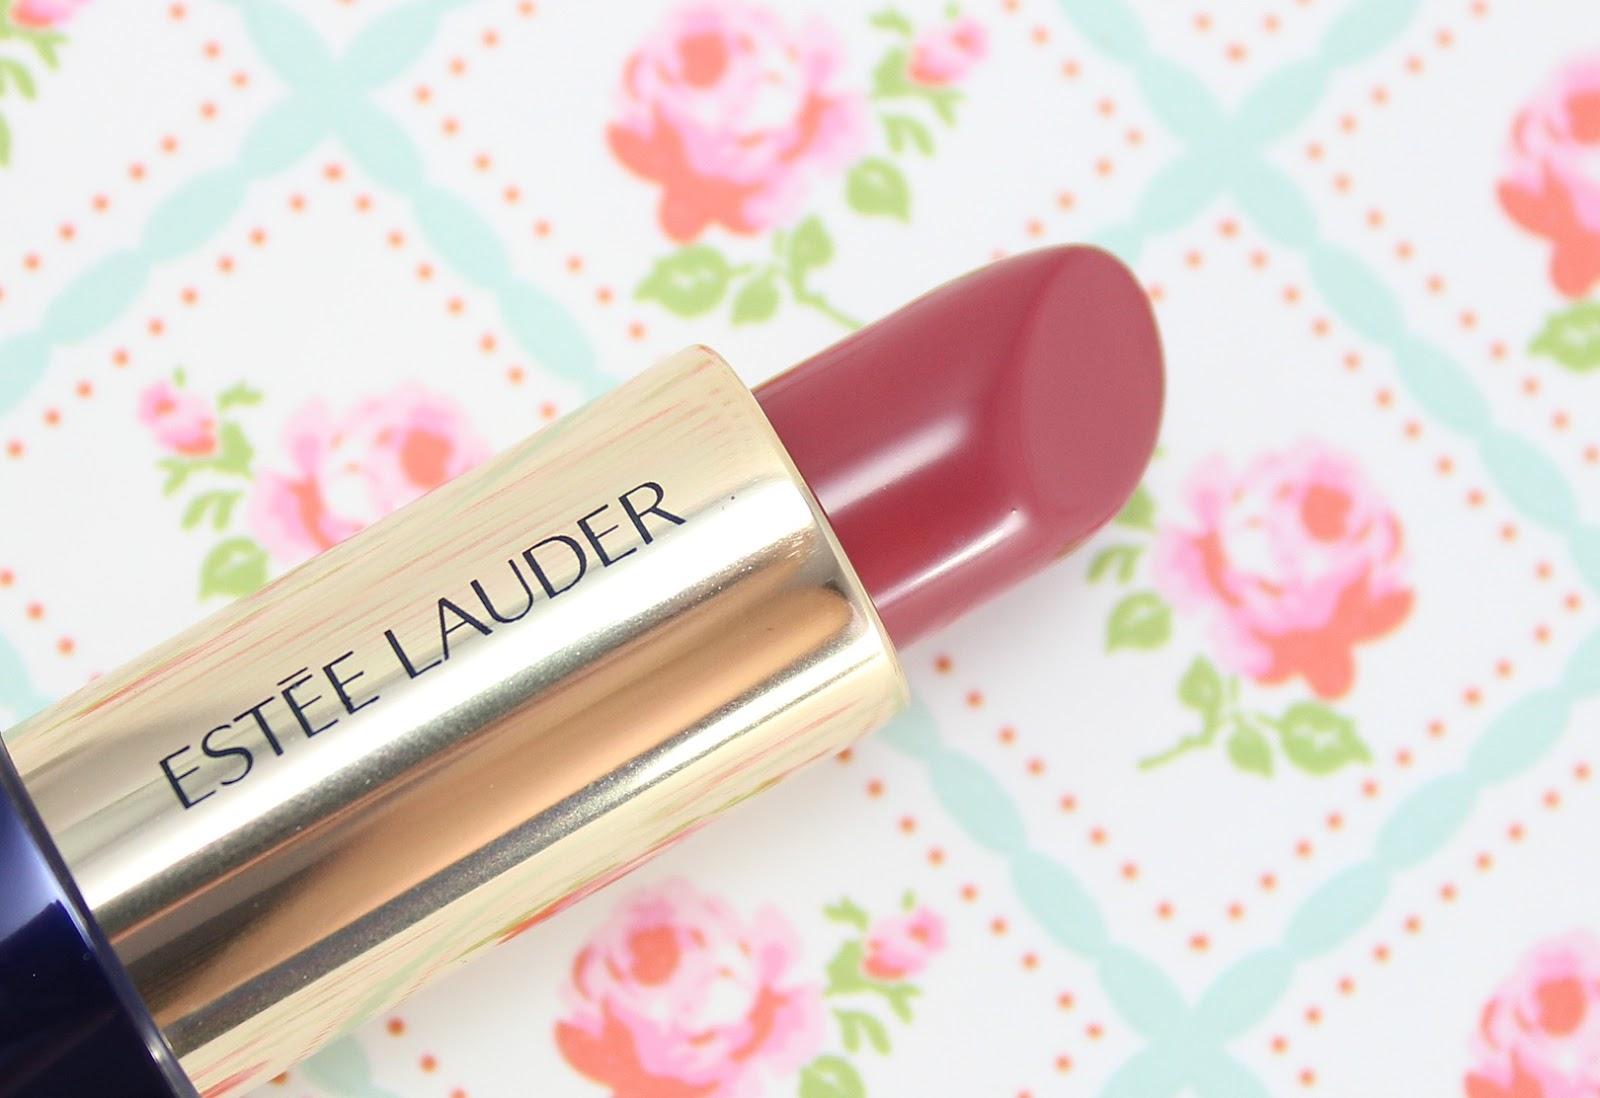 Estée Lauder Lipstick - Rebellious Rose